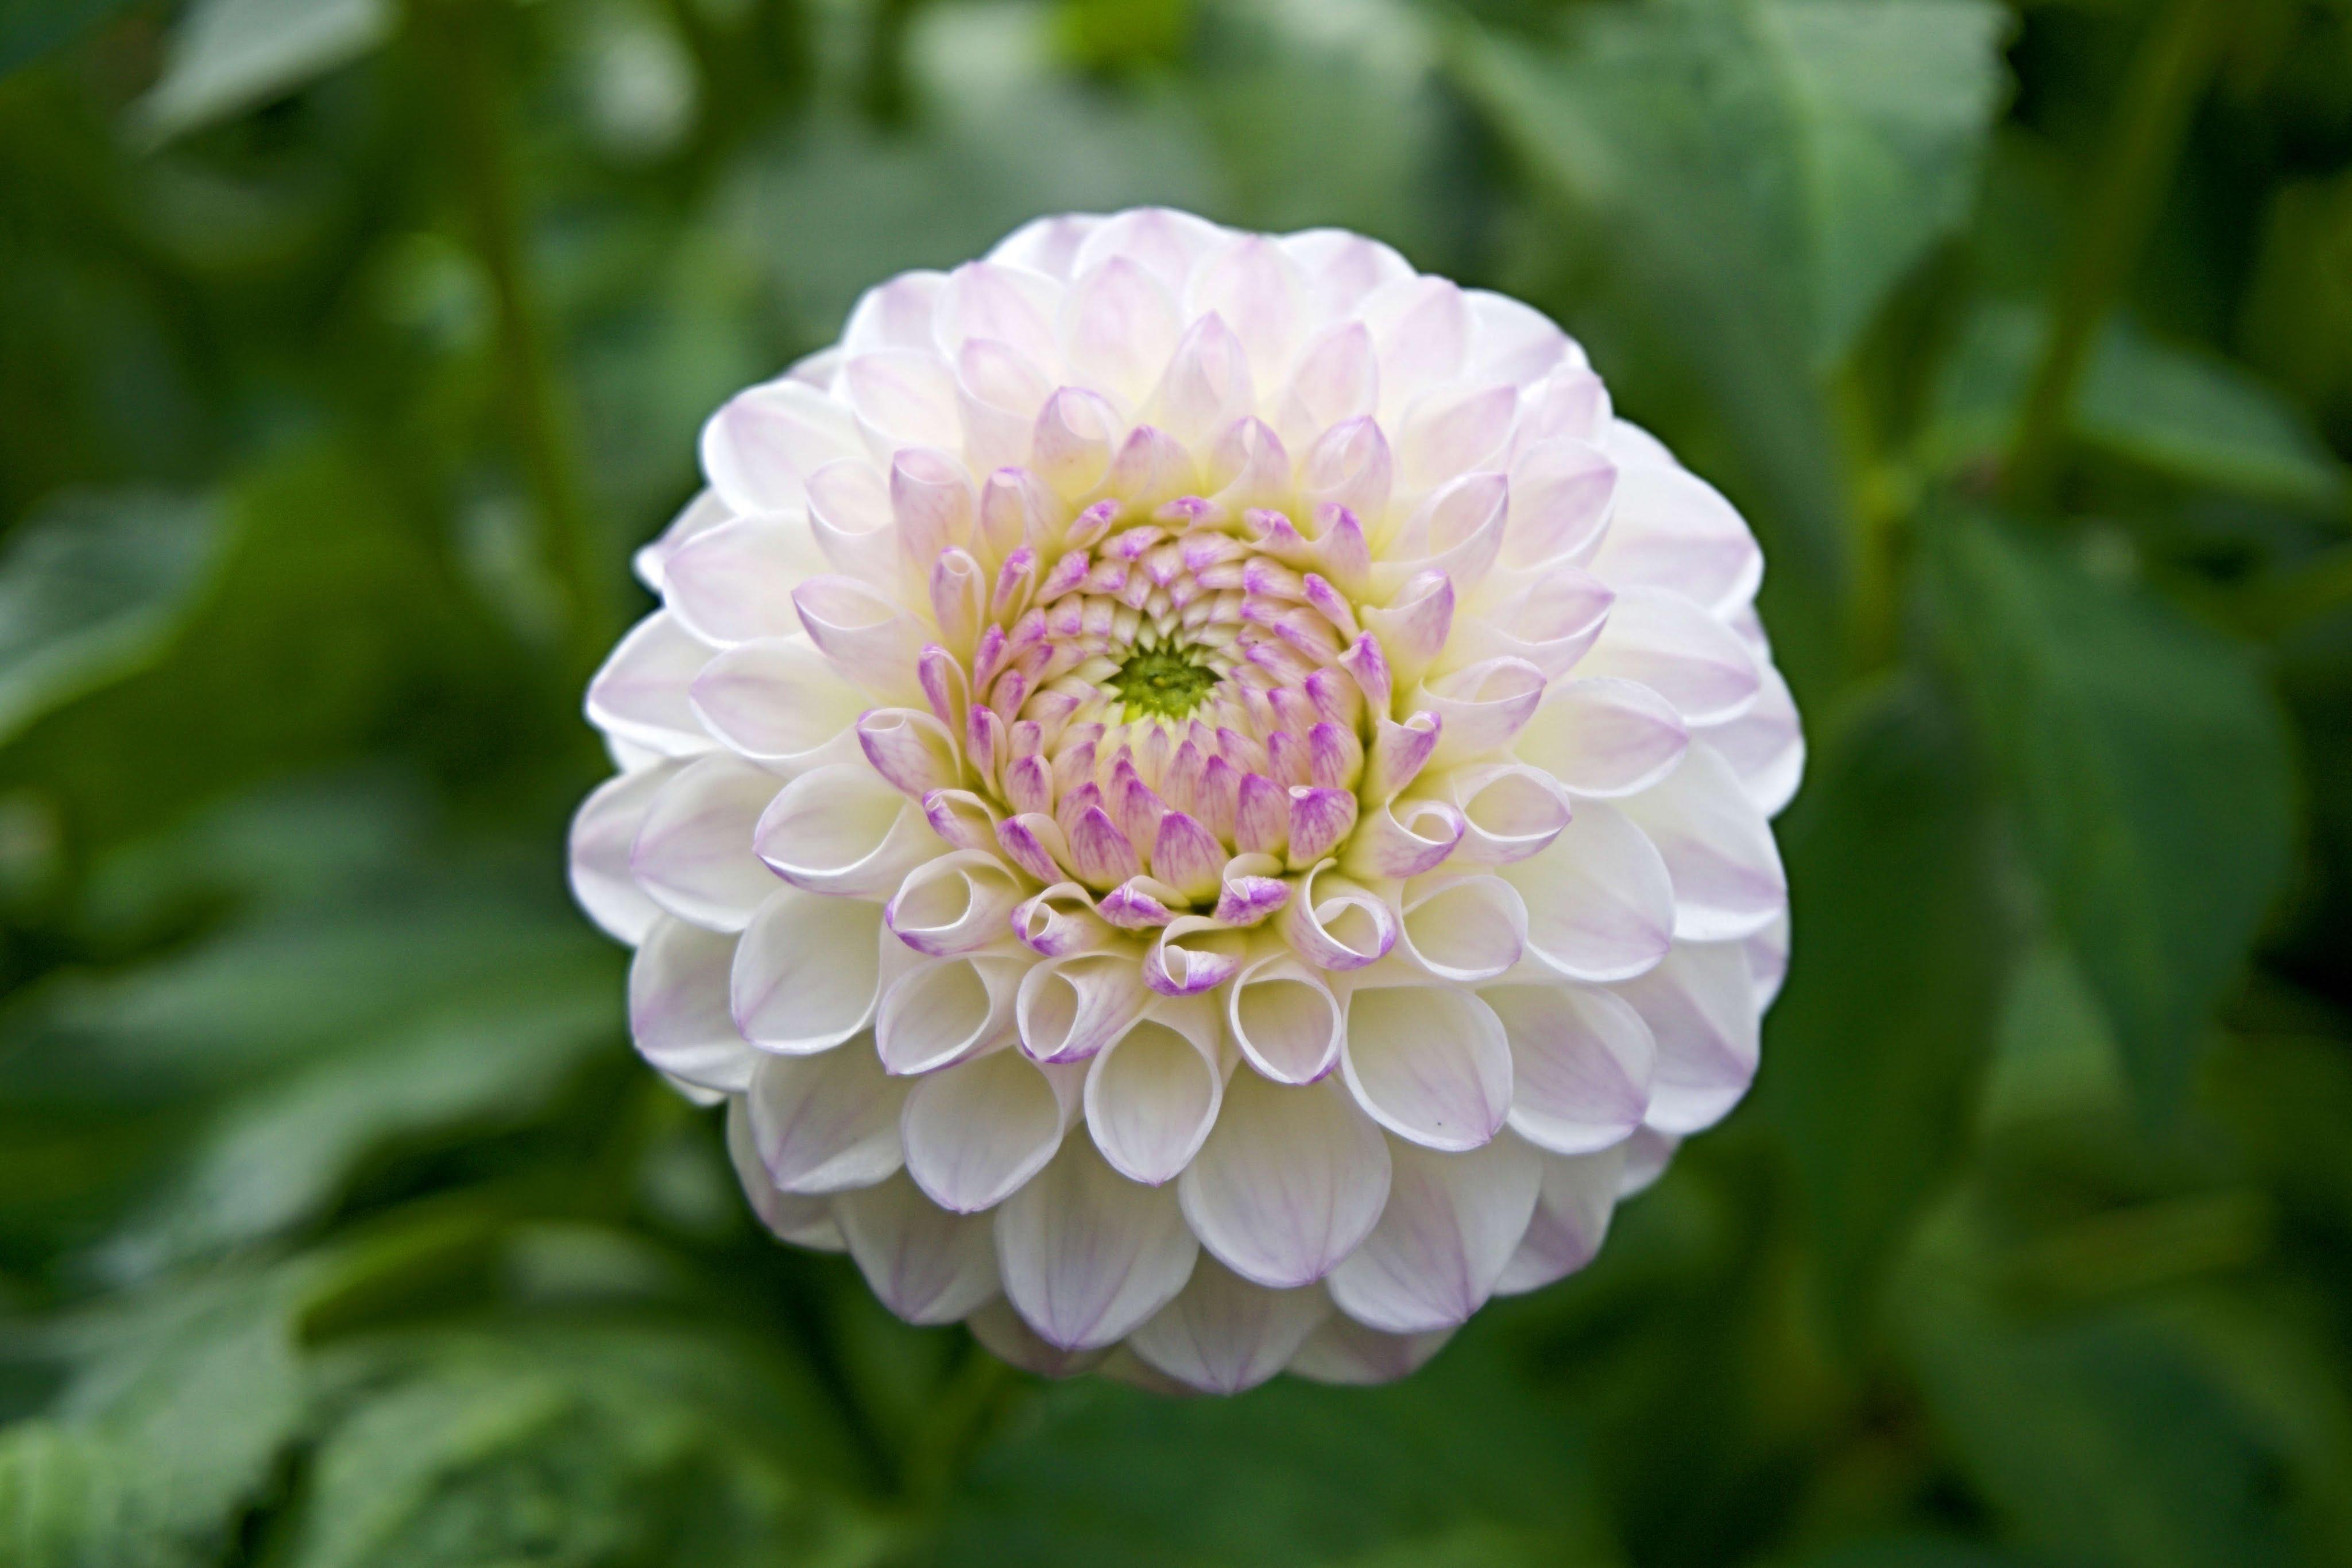 The Beauty Of Dahlia Flower For Your Garden - YouTube